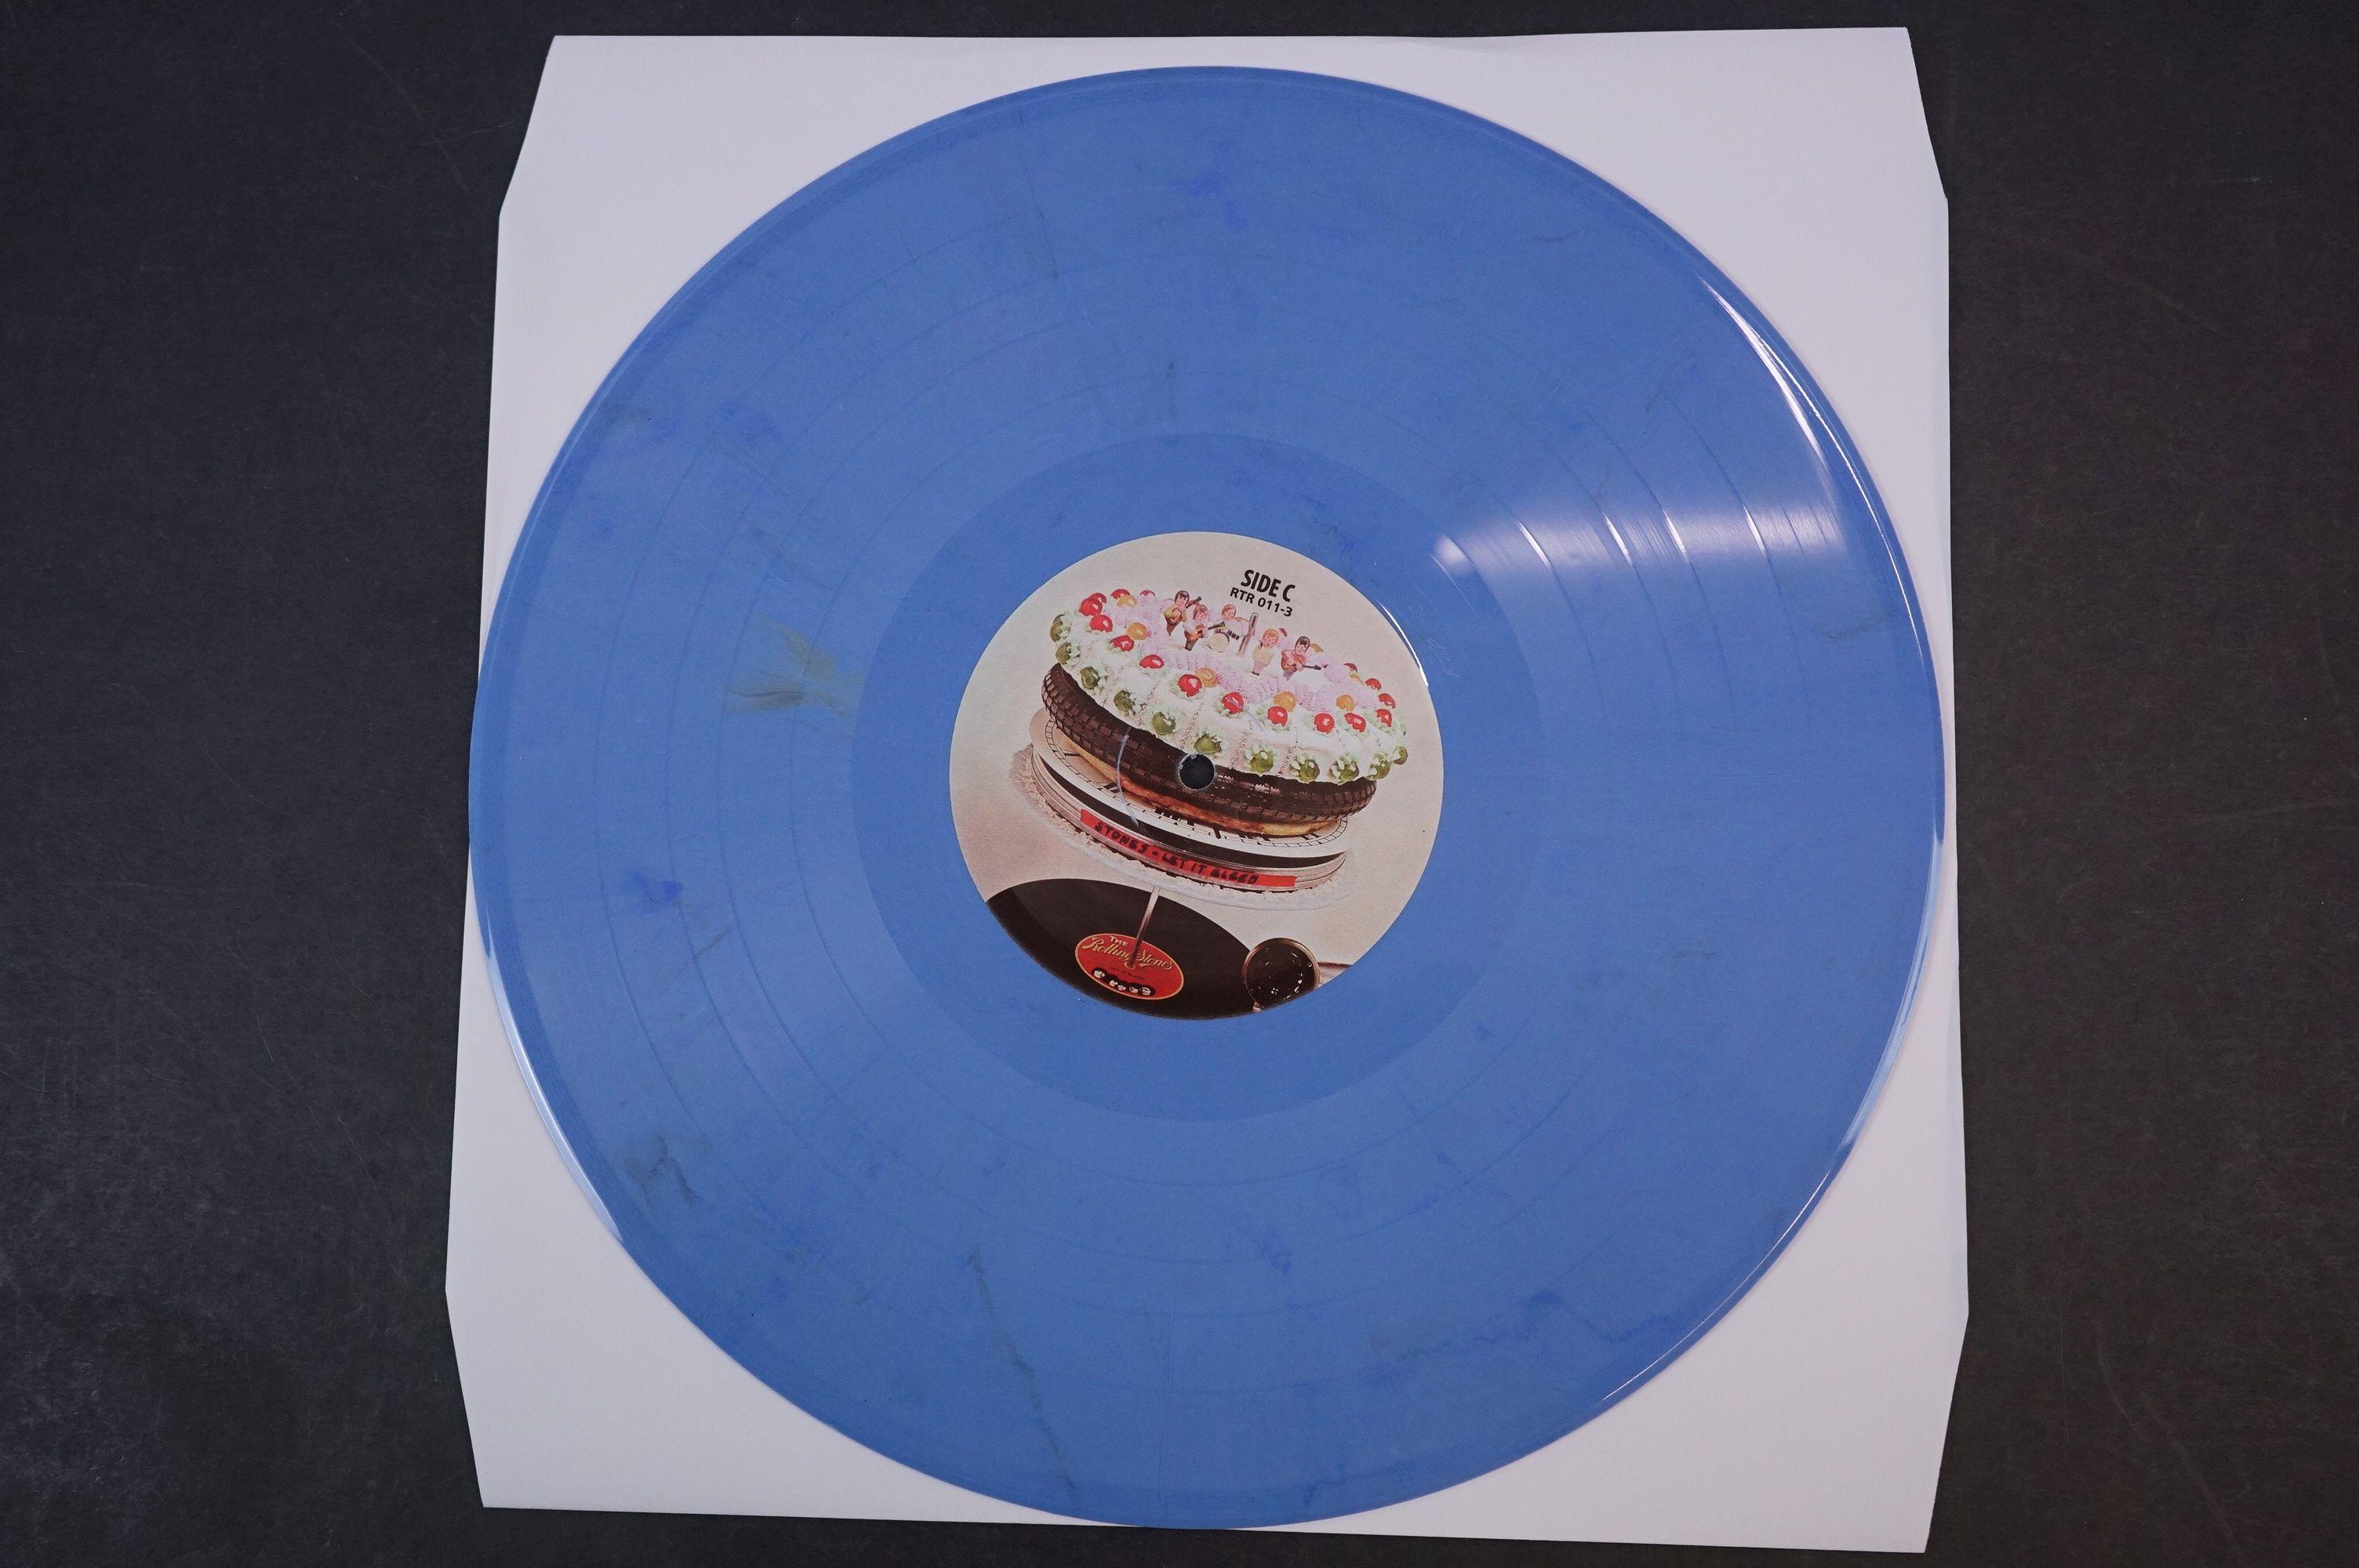 Vinyl - ltd edn The Real Alternate Album Rolling Stones Let It Bleed 3 LP / 2 CD Box Set RTR011, - Image 6 of 9